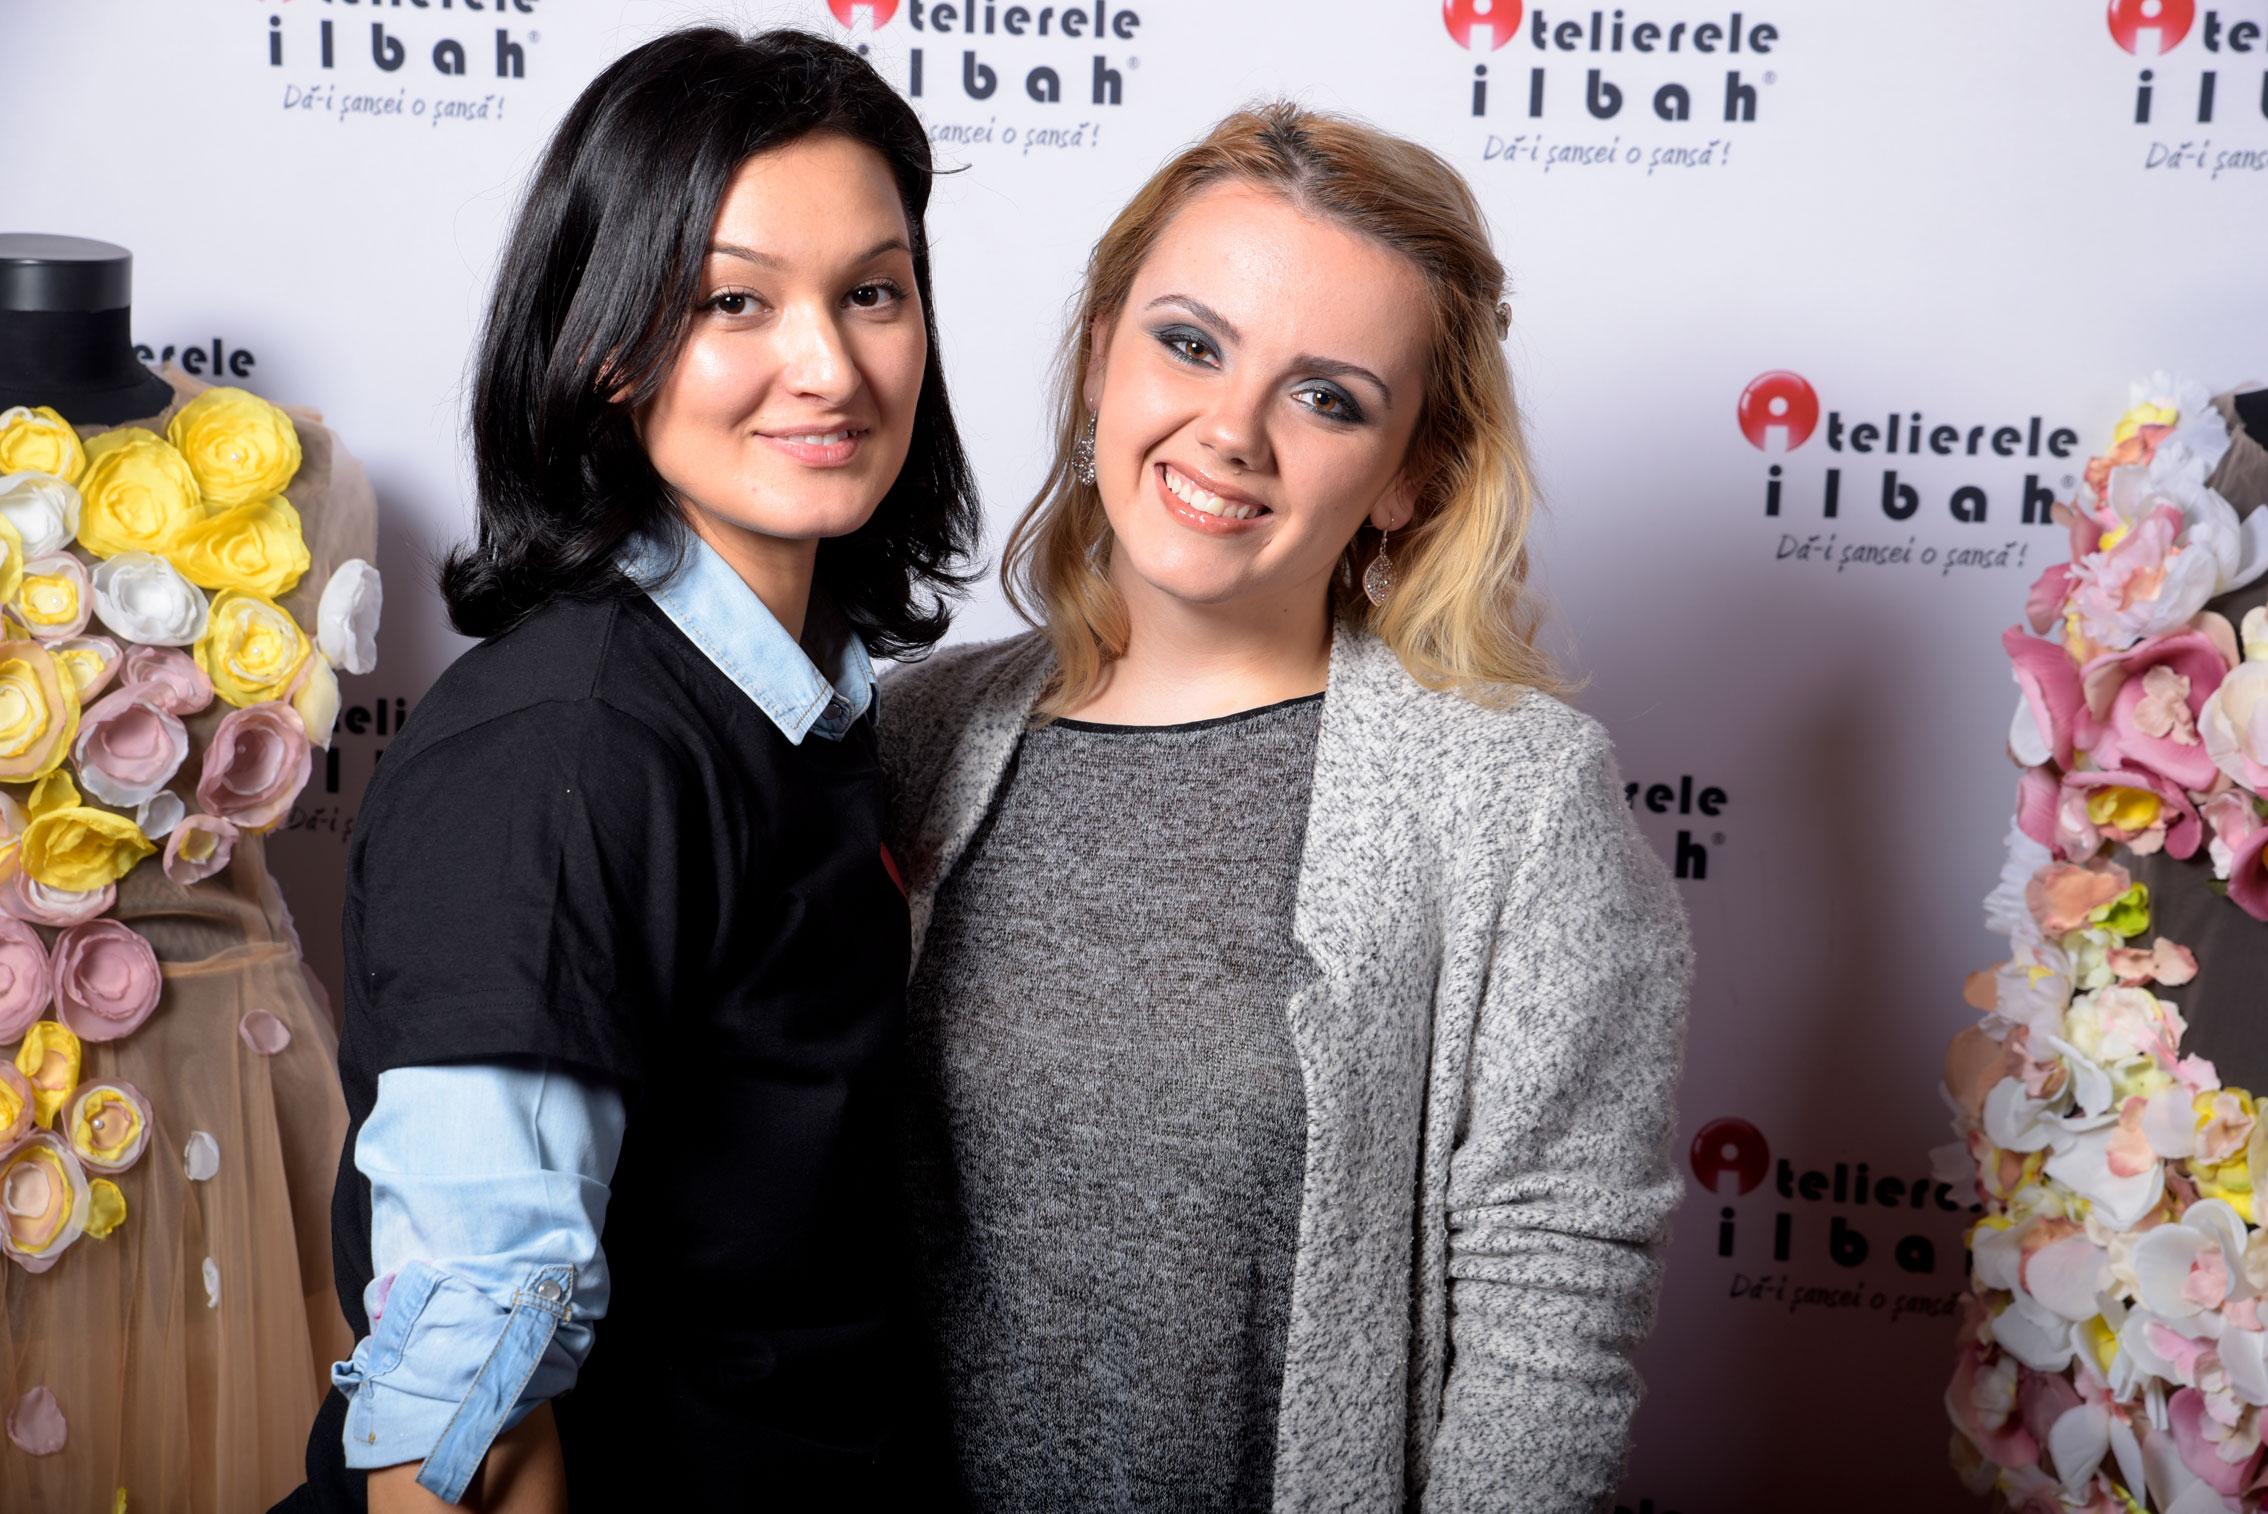 make-up-fest-atelierele-ilbah-3